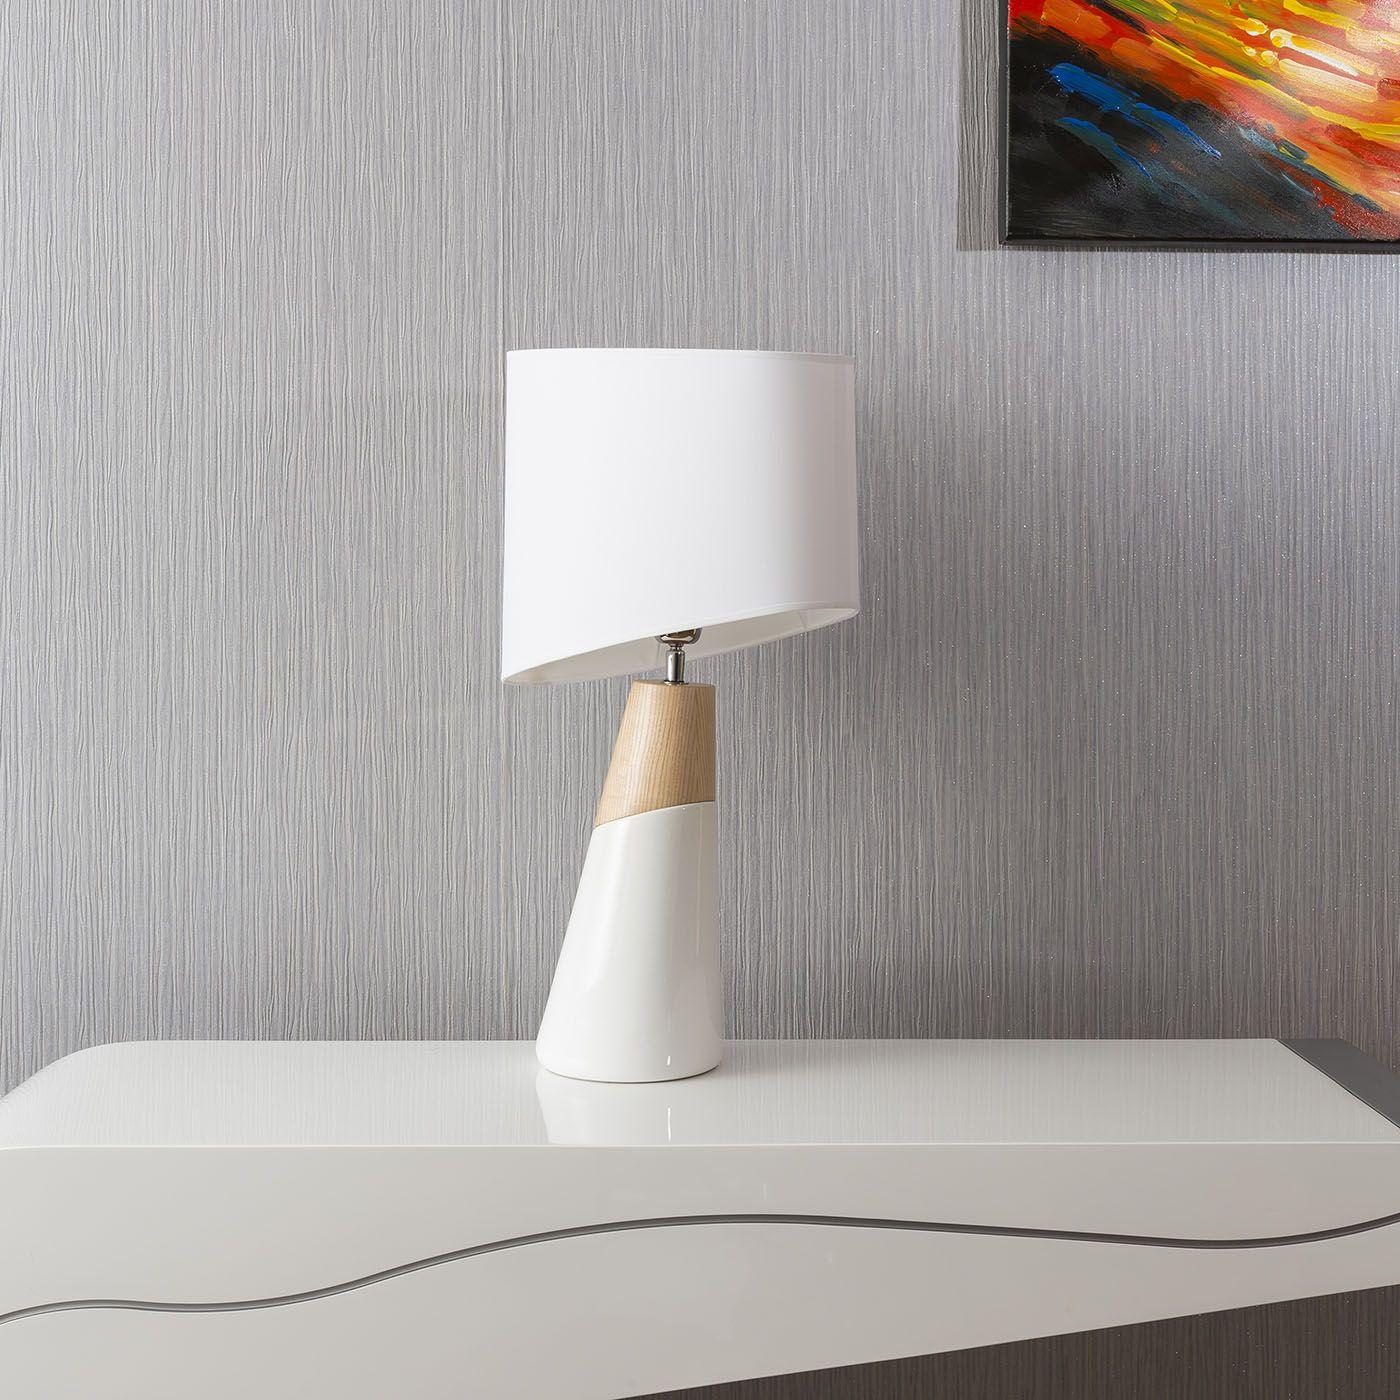 Envy Lighting Modern High End Tall Table / Bedside Lamp